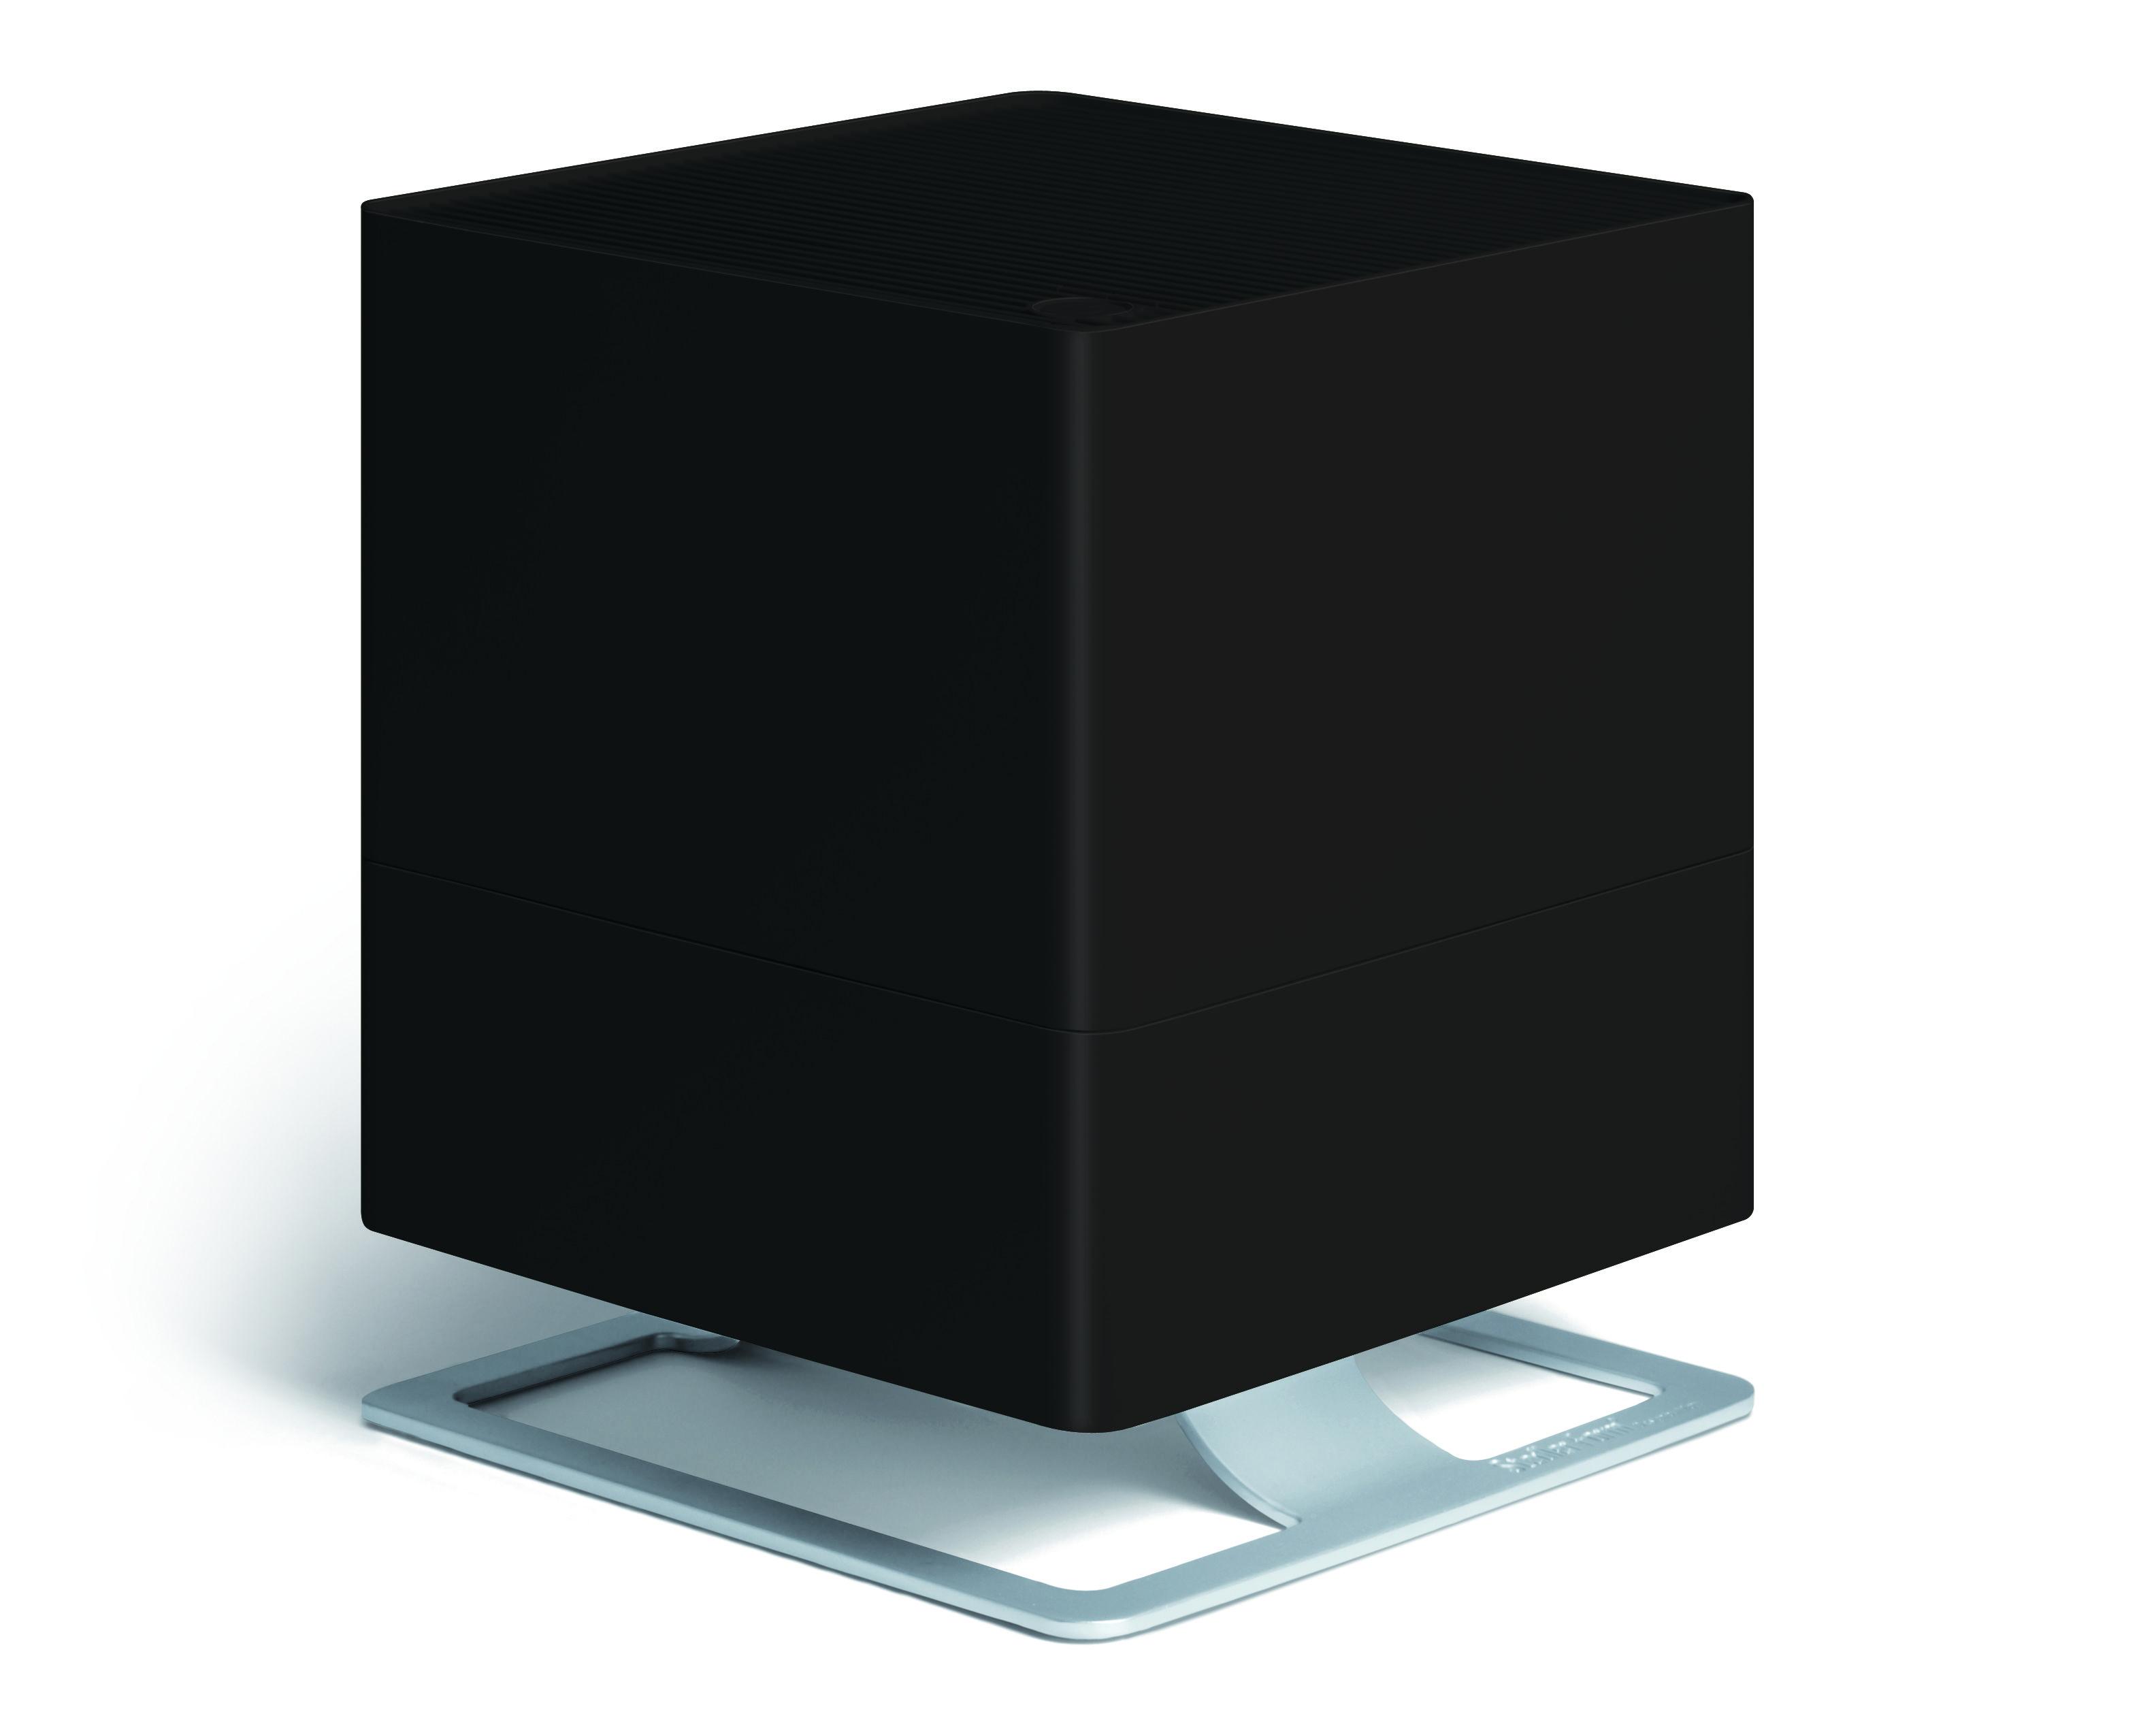 Stadler Form OSKAR Humidifier Humidifier, Dimmable led